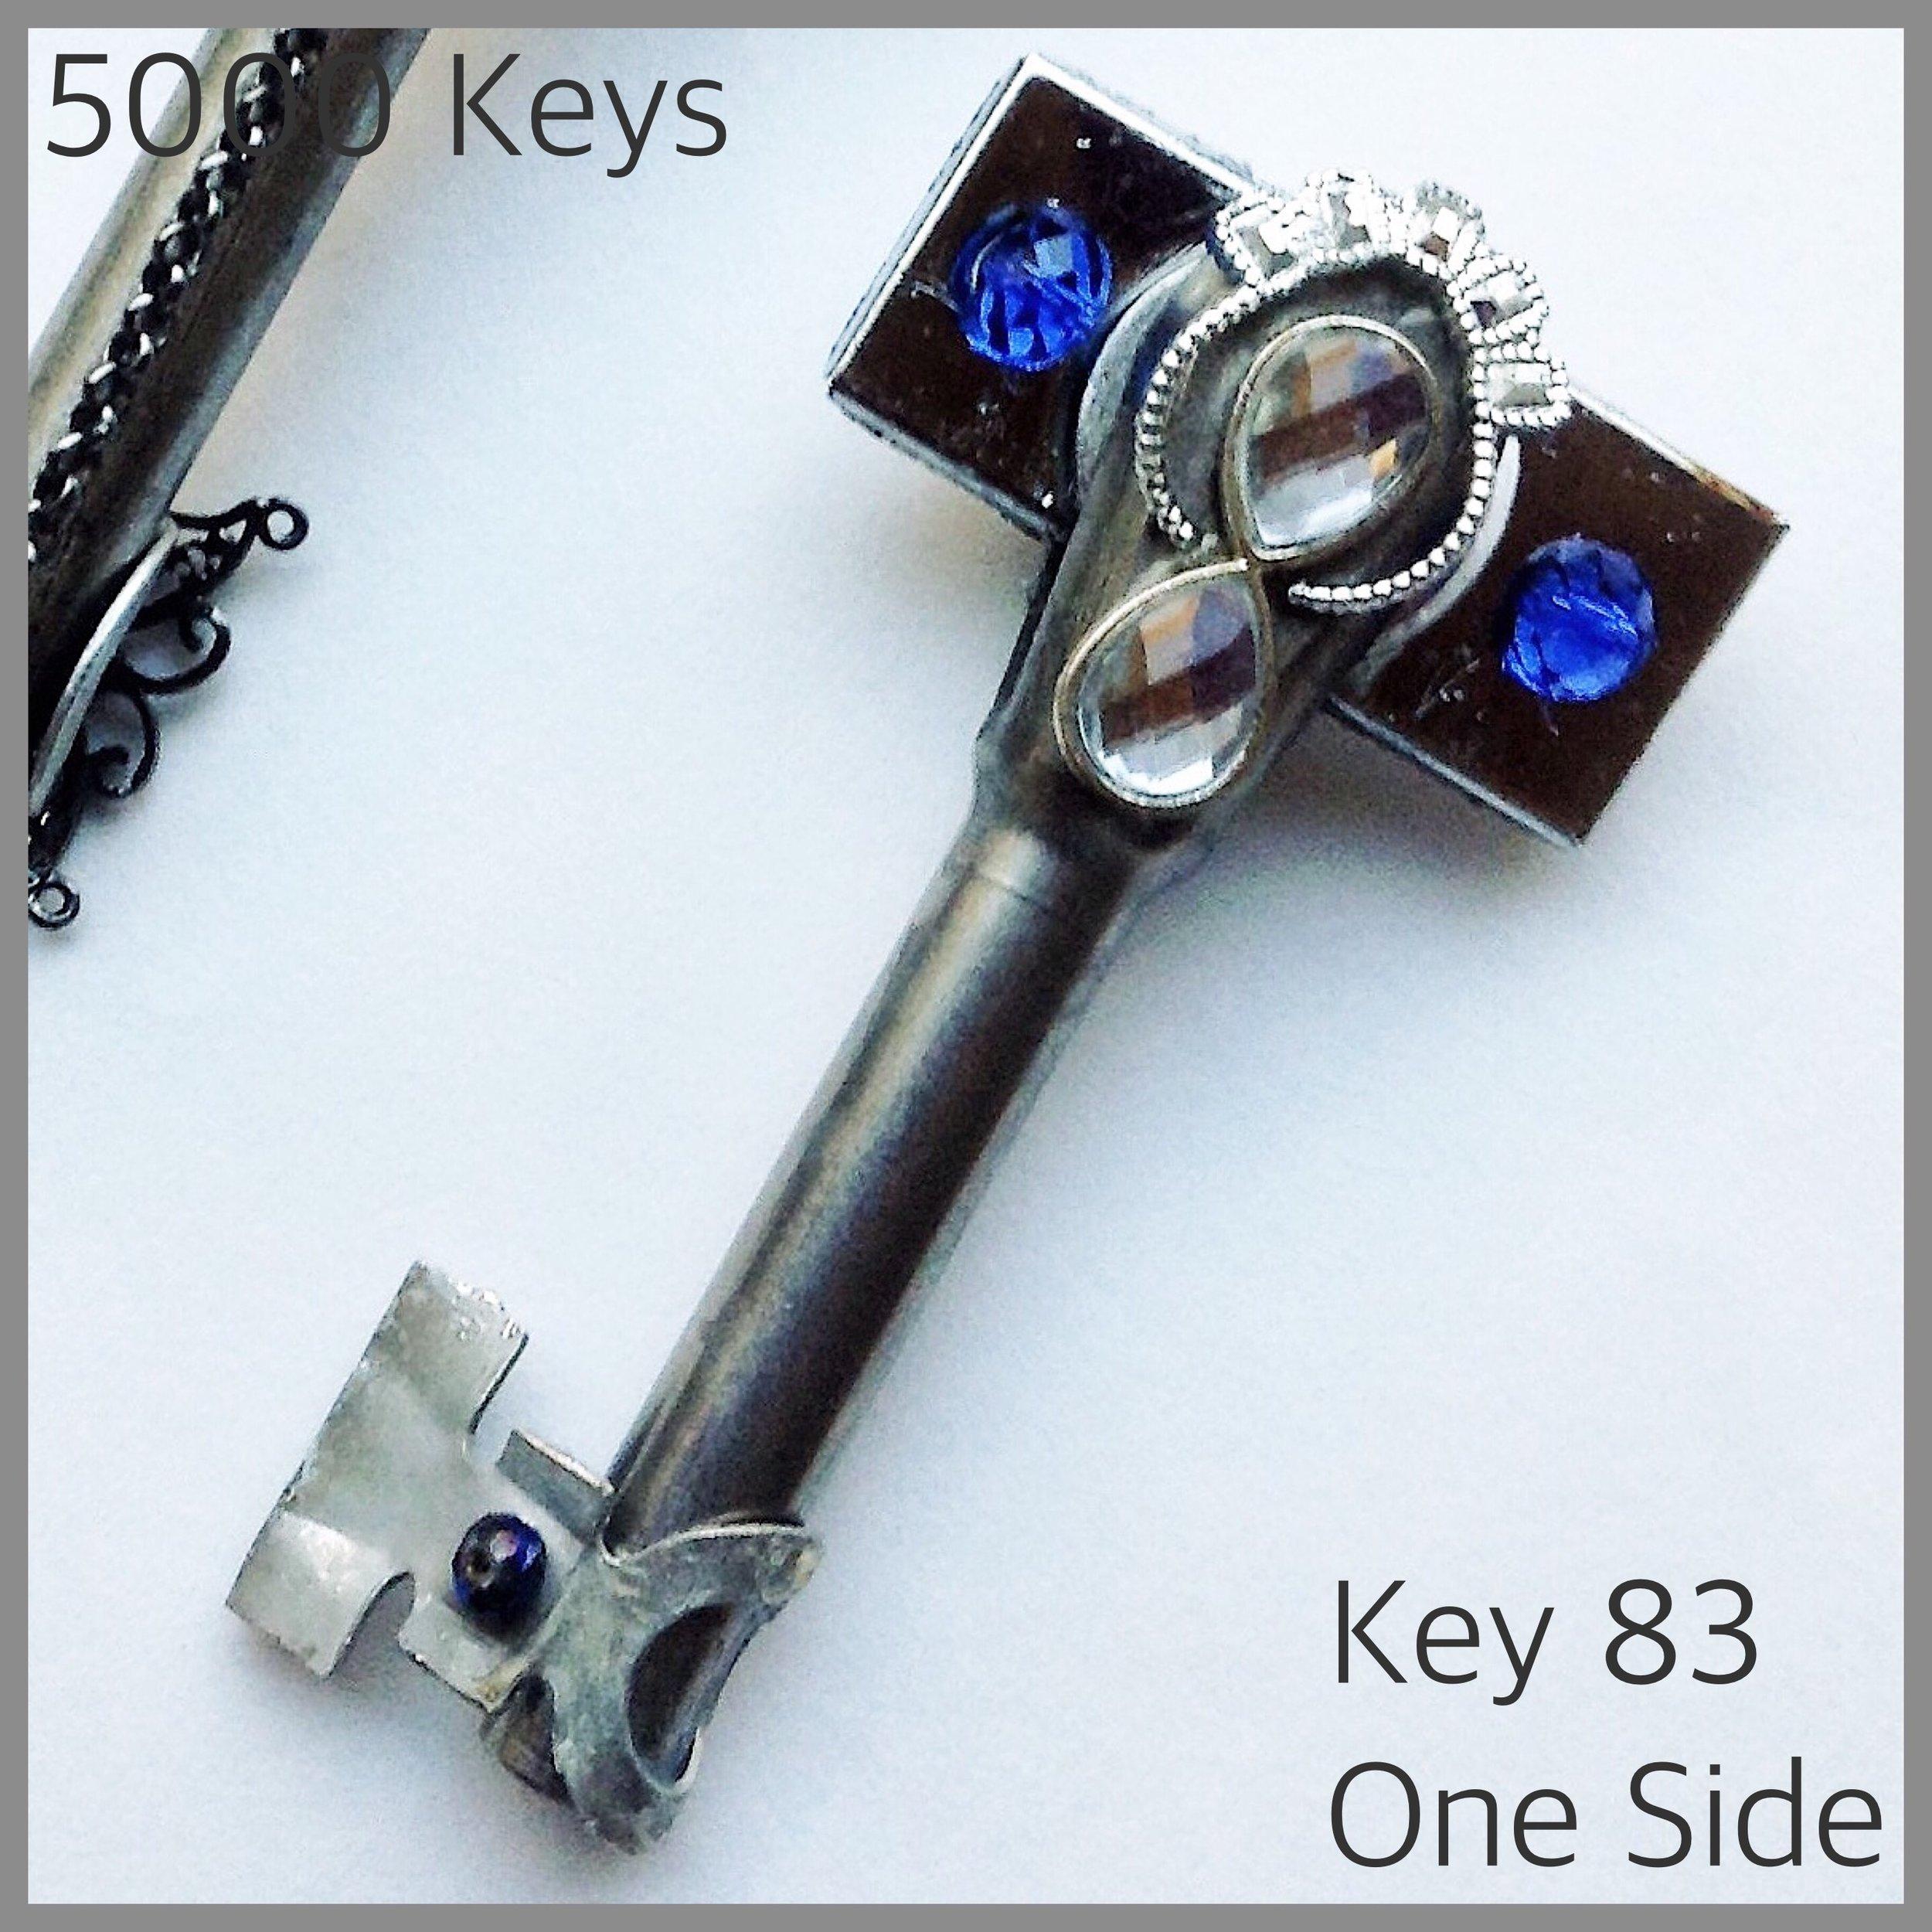 Key 83 one side - 1.JPG